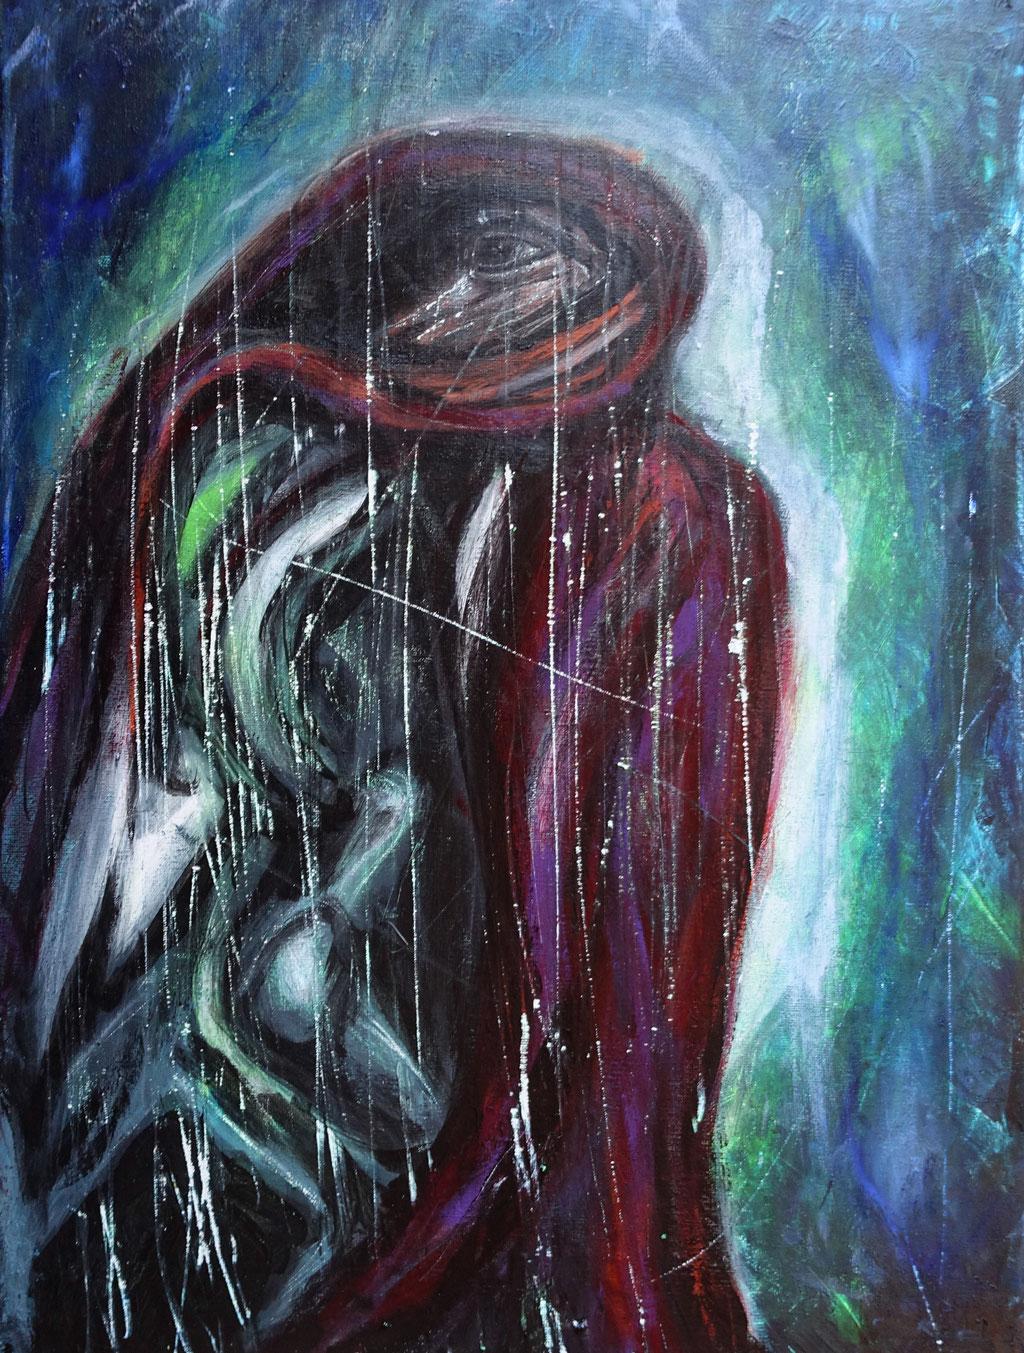 """außer mir"", Acryl auf Leinwand, 40x30 cm"